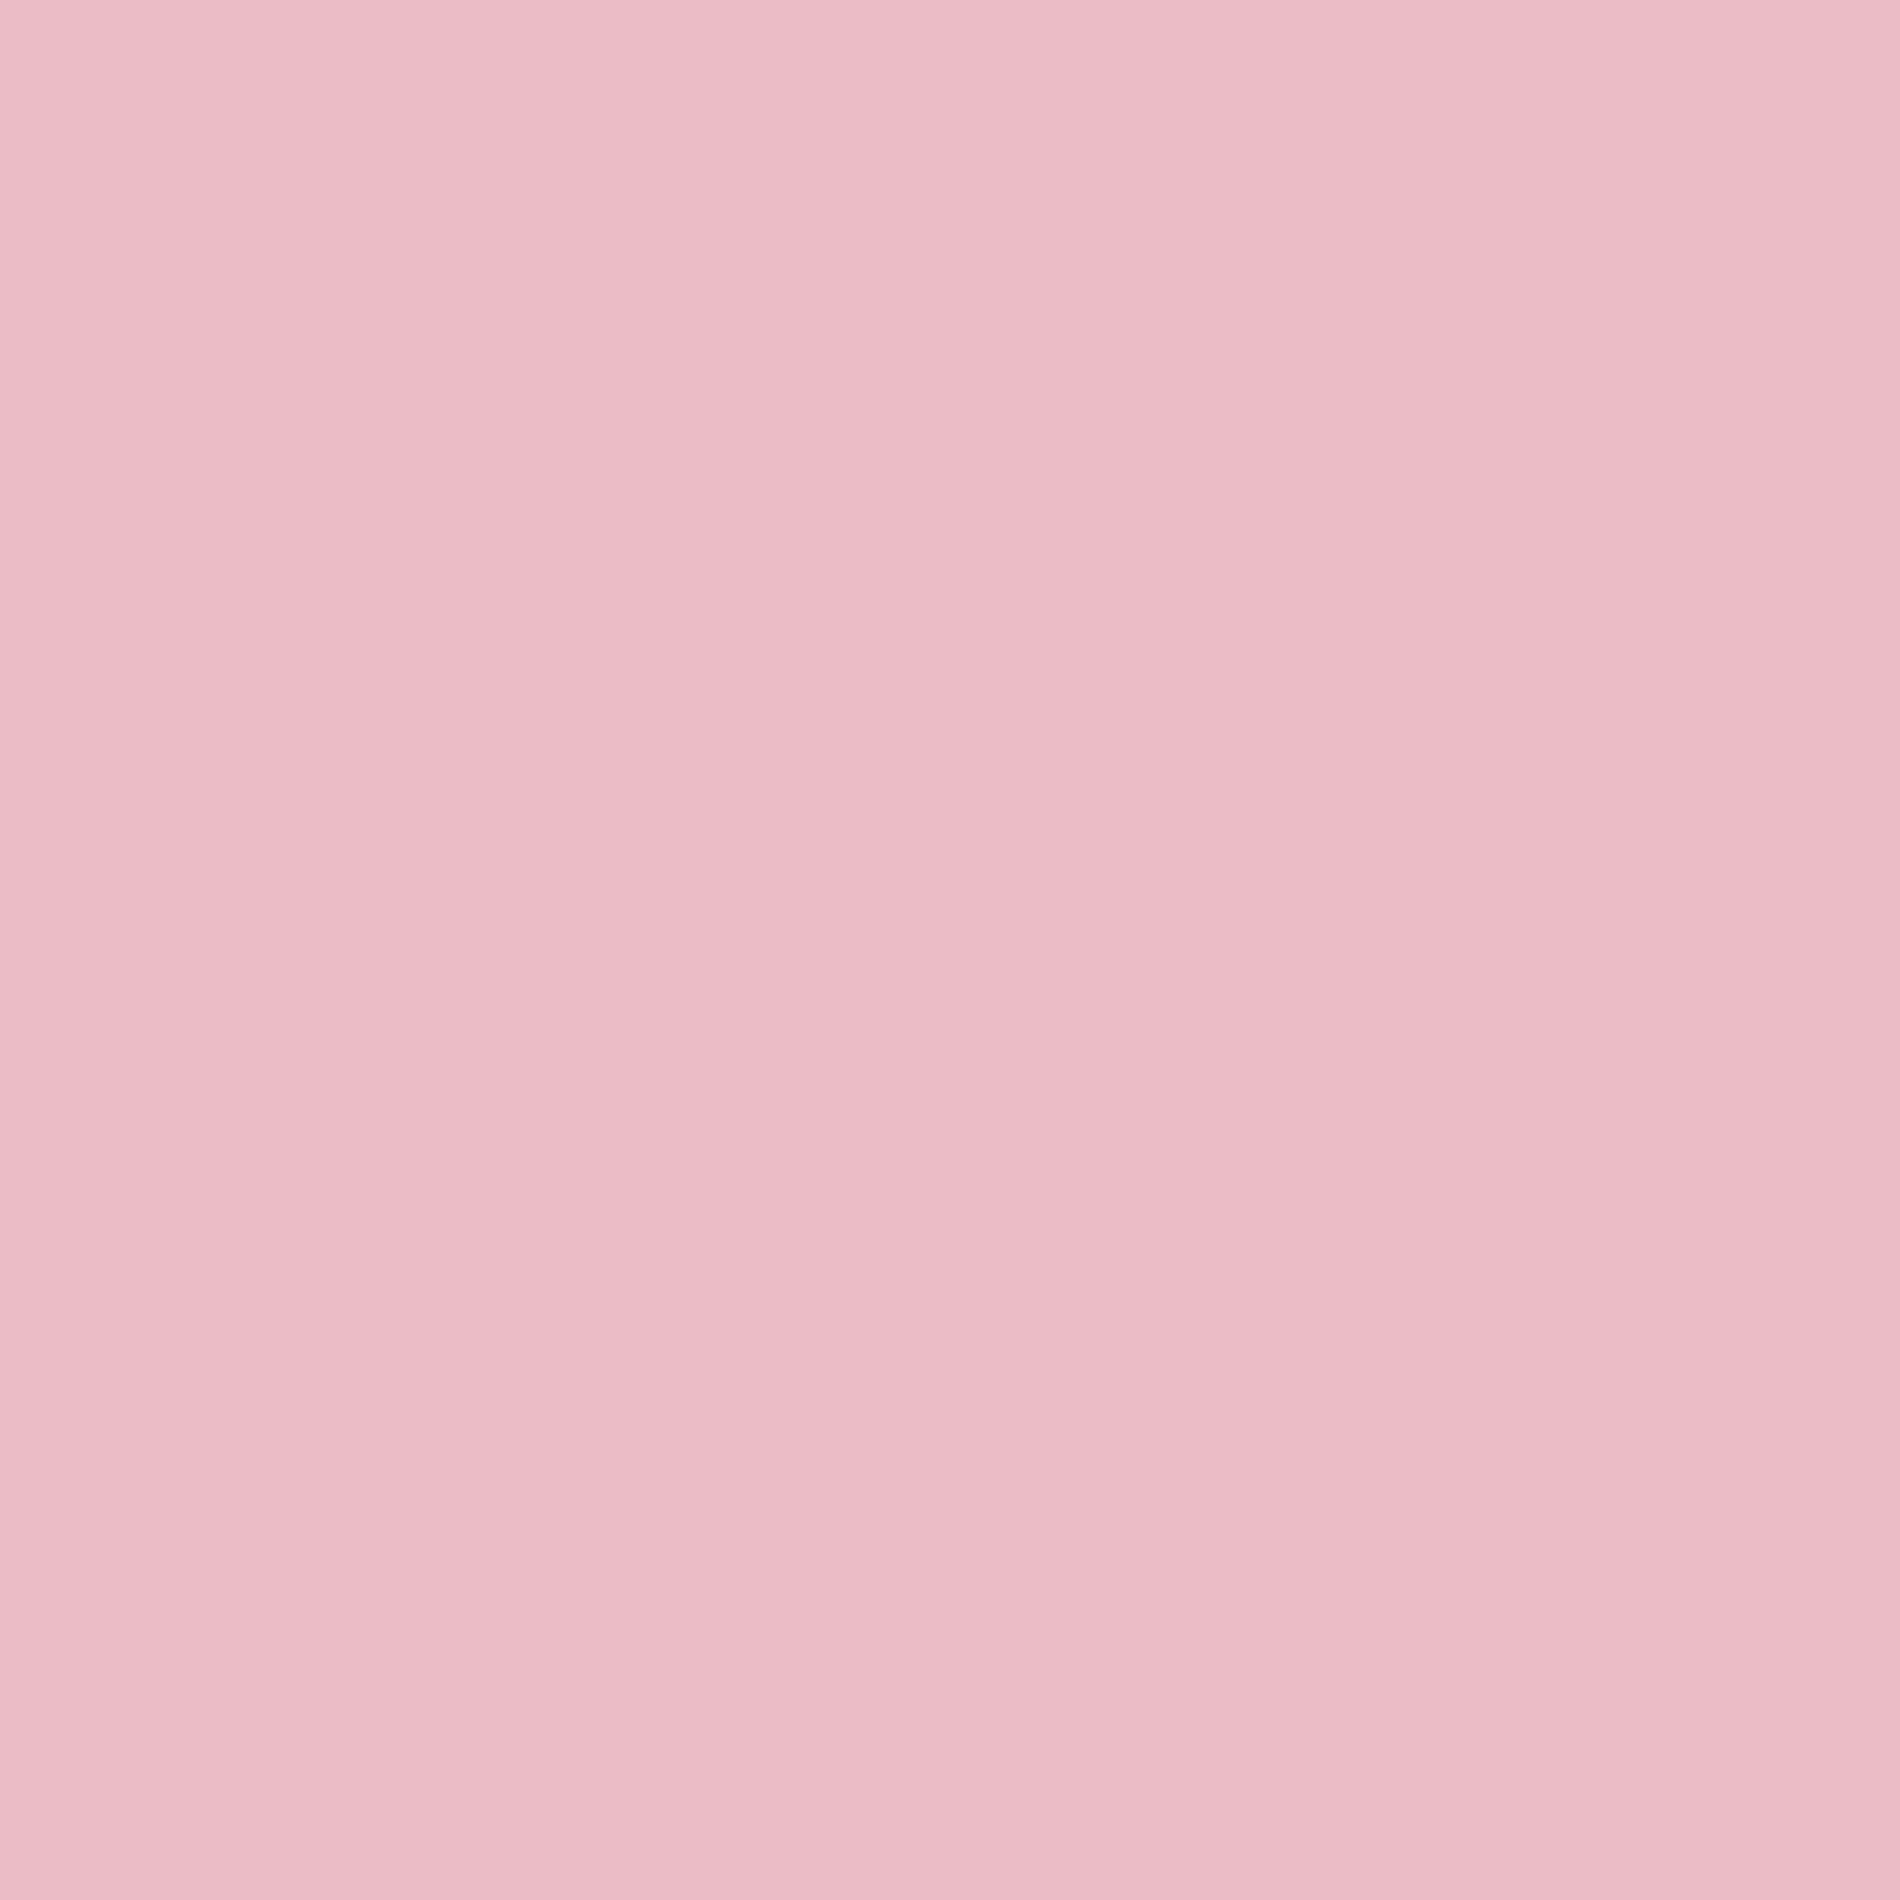 60 - rosa